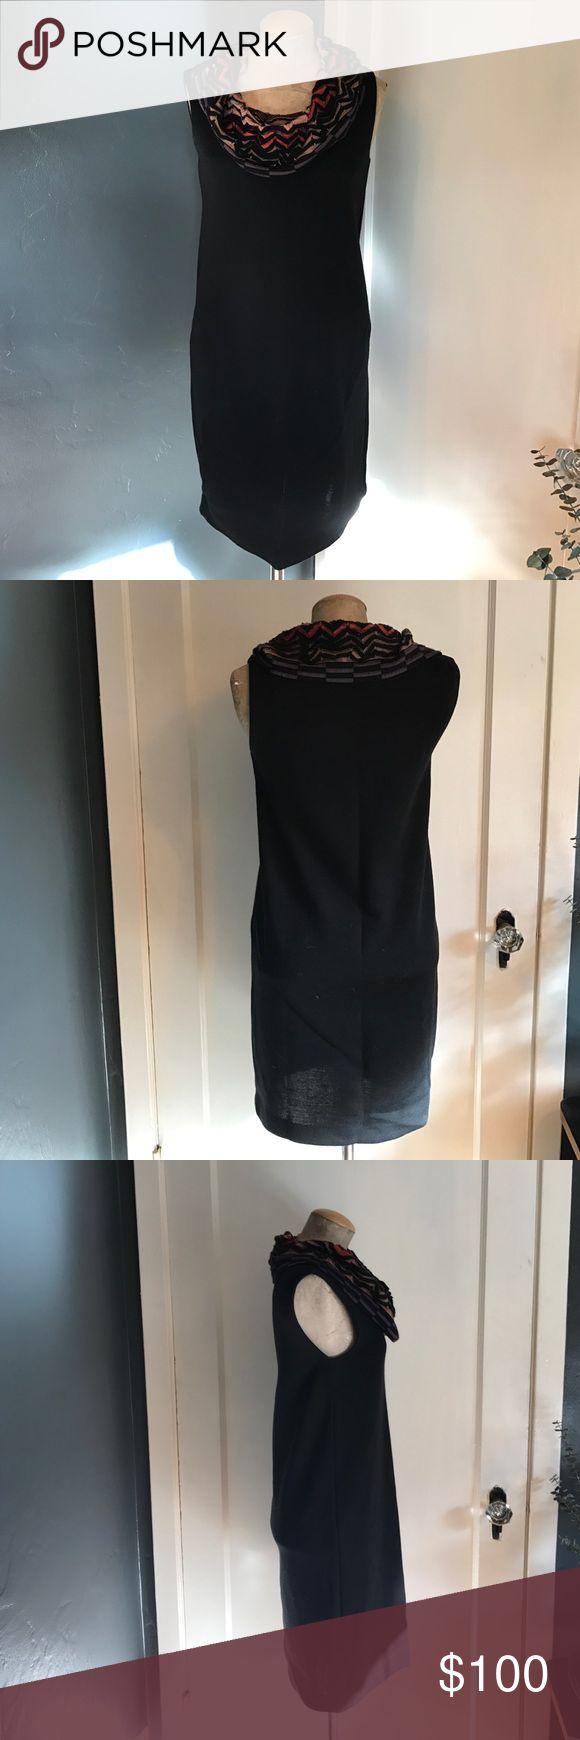 M MISSONI dress I'm selling my M MISSONI dress. The size is unknown but it fits best sz M. It's a black knit with the iconic MISSONI print cowl neck. M by Missoni Dresses